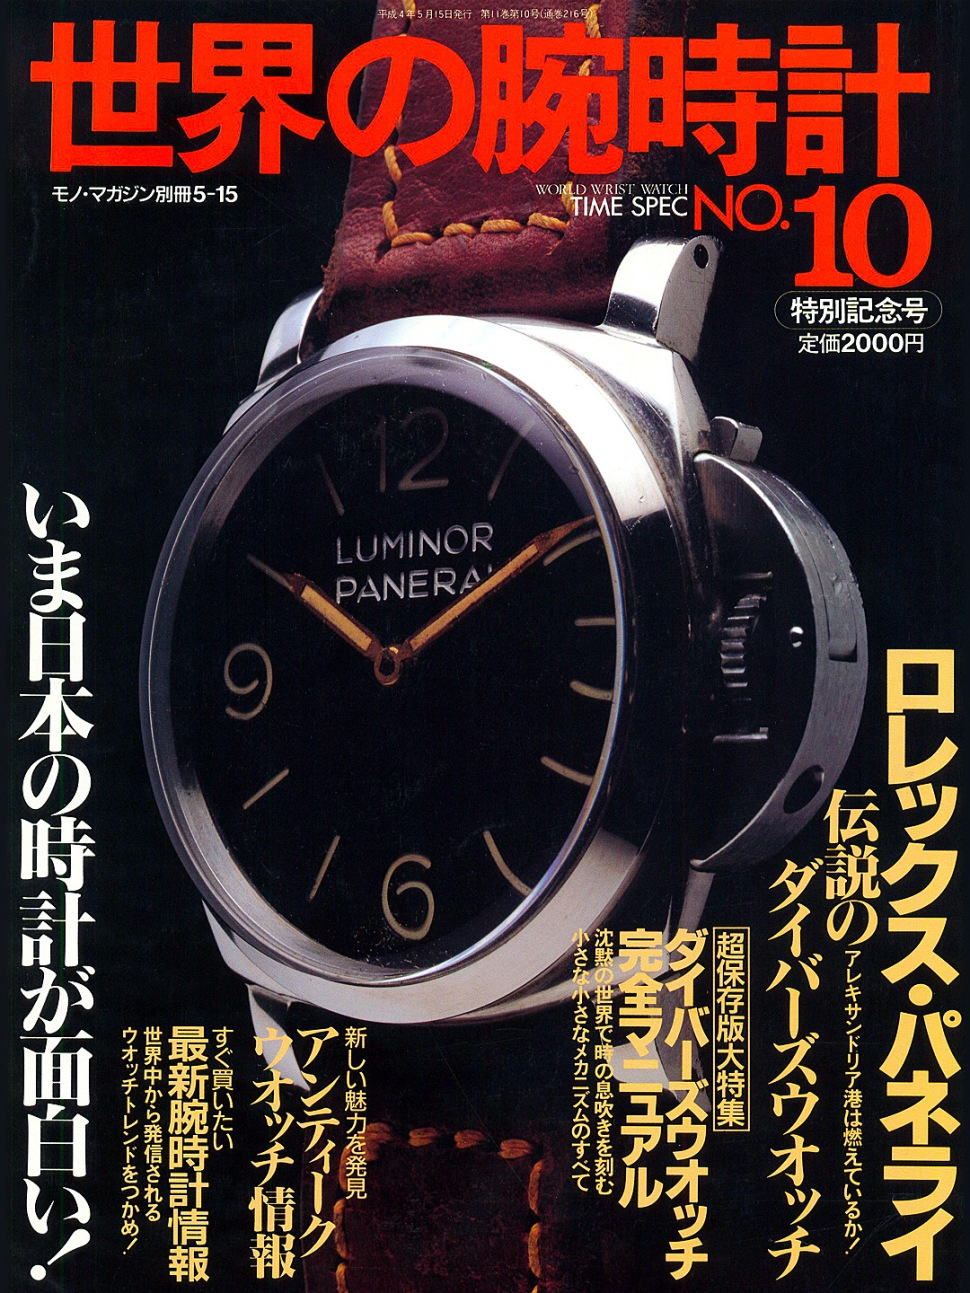 200402-officine-panerai-japanese-article-1992-stephan-ciejka